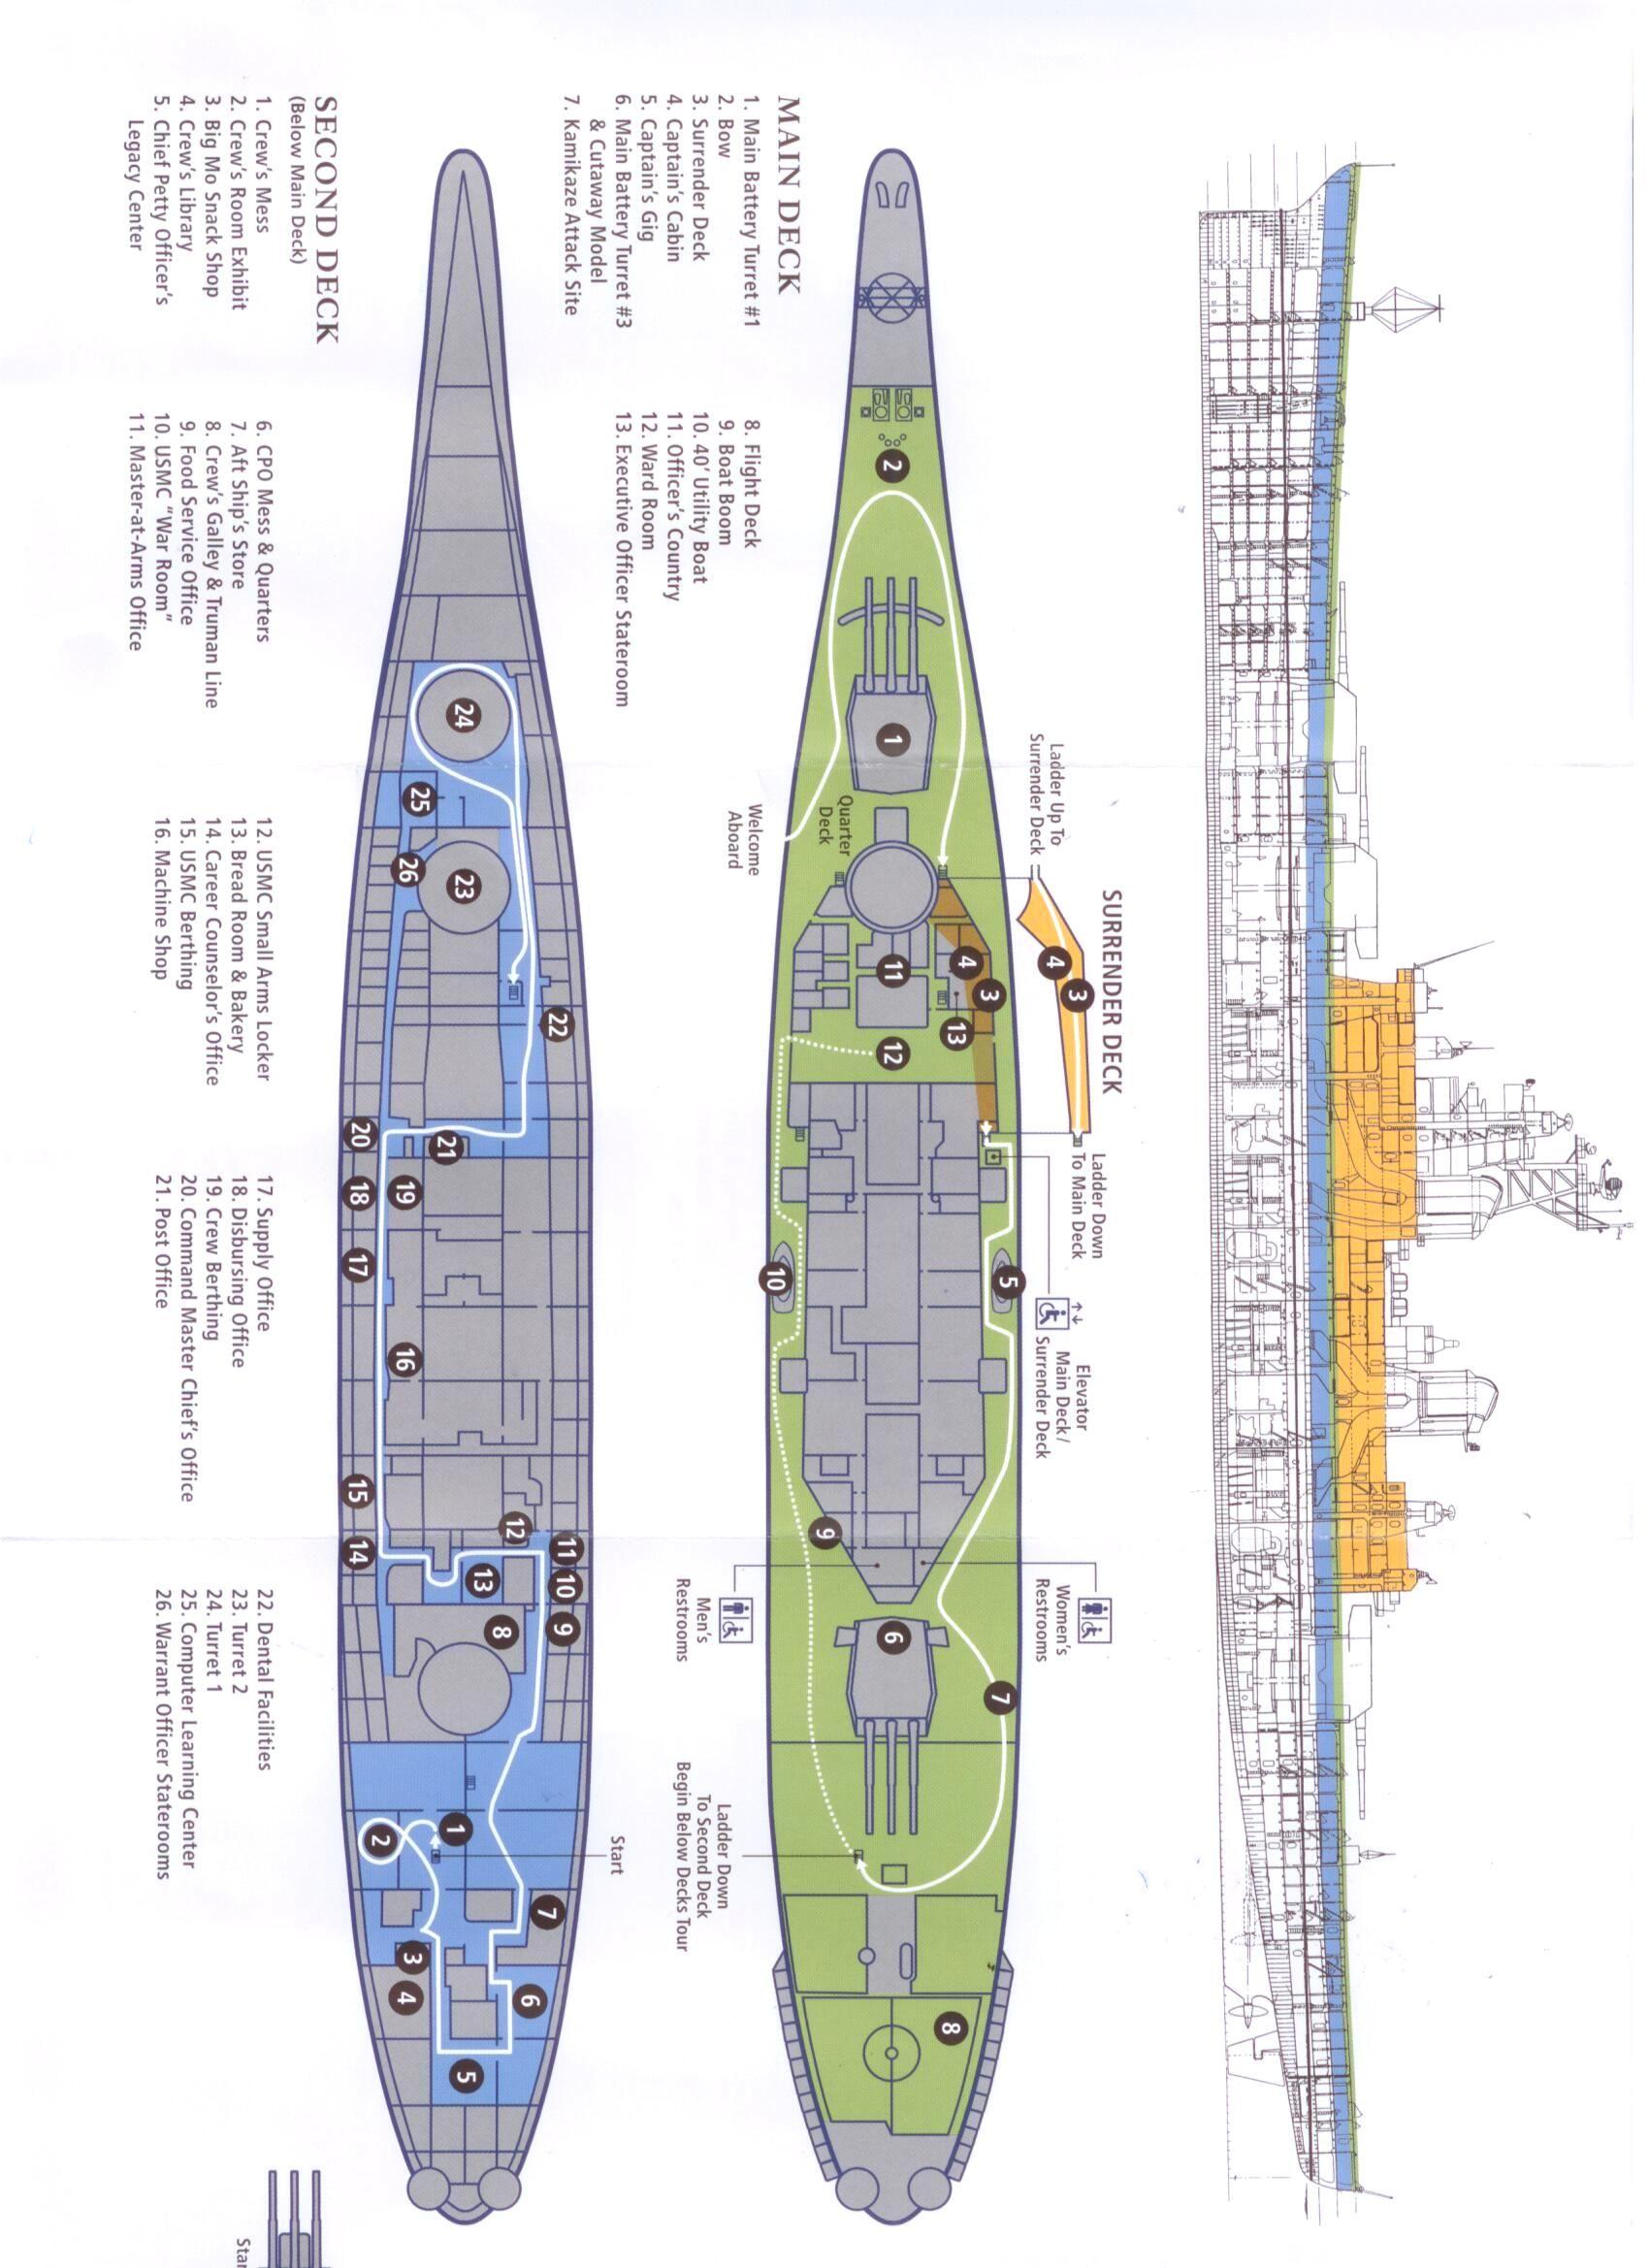 iowa class battleship hull designs google search. Black Bedroom Furniture Sets. Home Design Ideas